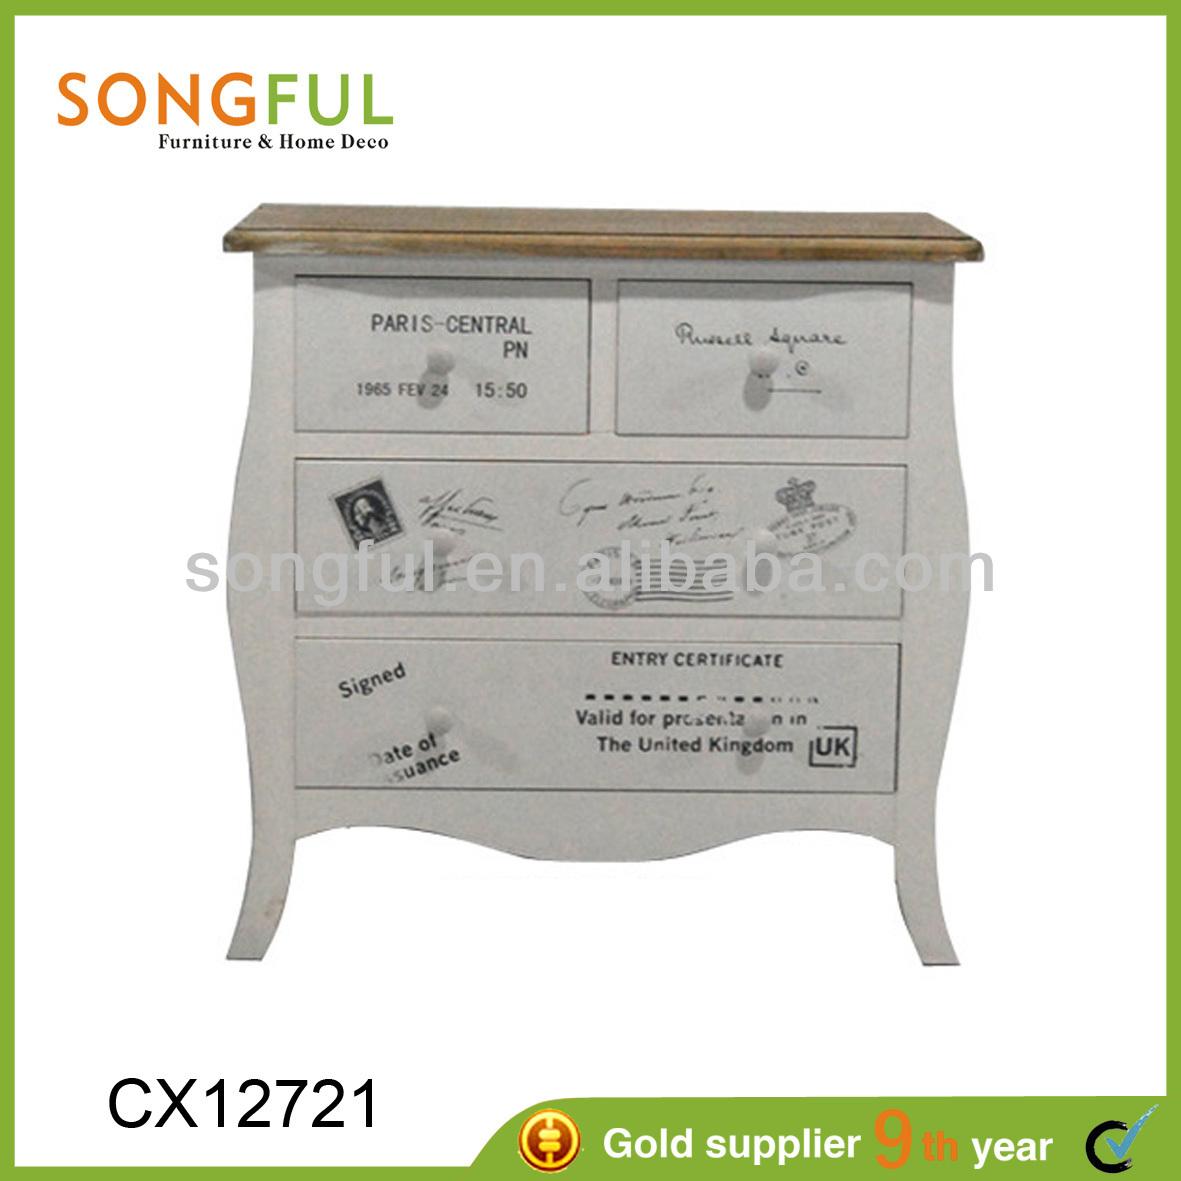 Standard Dimension Zebra Wood Furniture, Standard Dimension Zebra Wood  Furniture Suppliers And Manufacturers At Alibaba